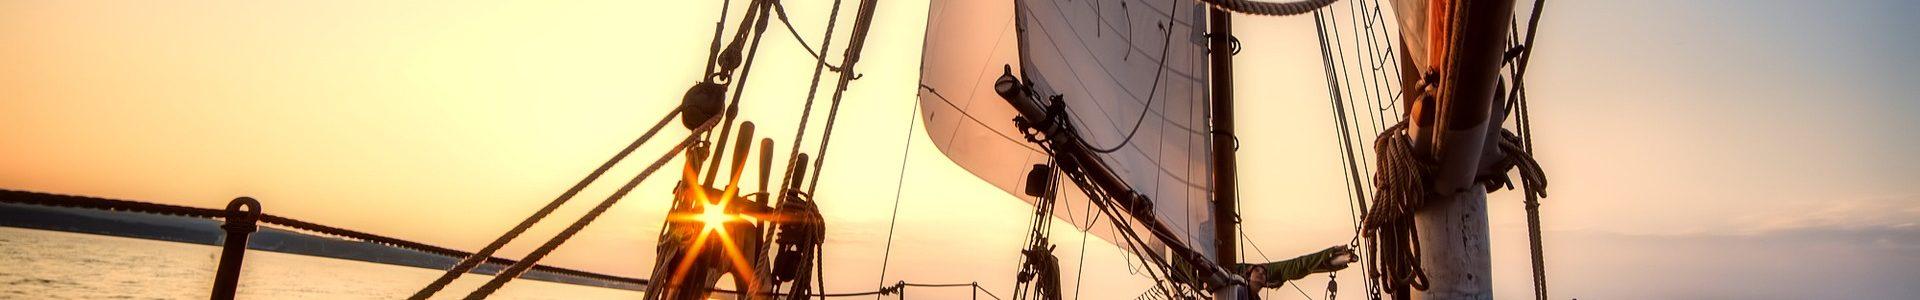 sailing 2542901 1920 1920x300 - Wino pod żaglami - winnice Dalmacji